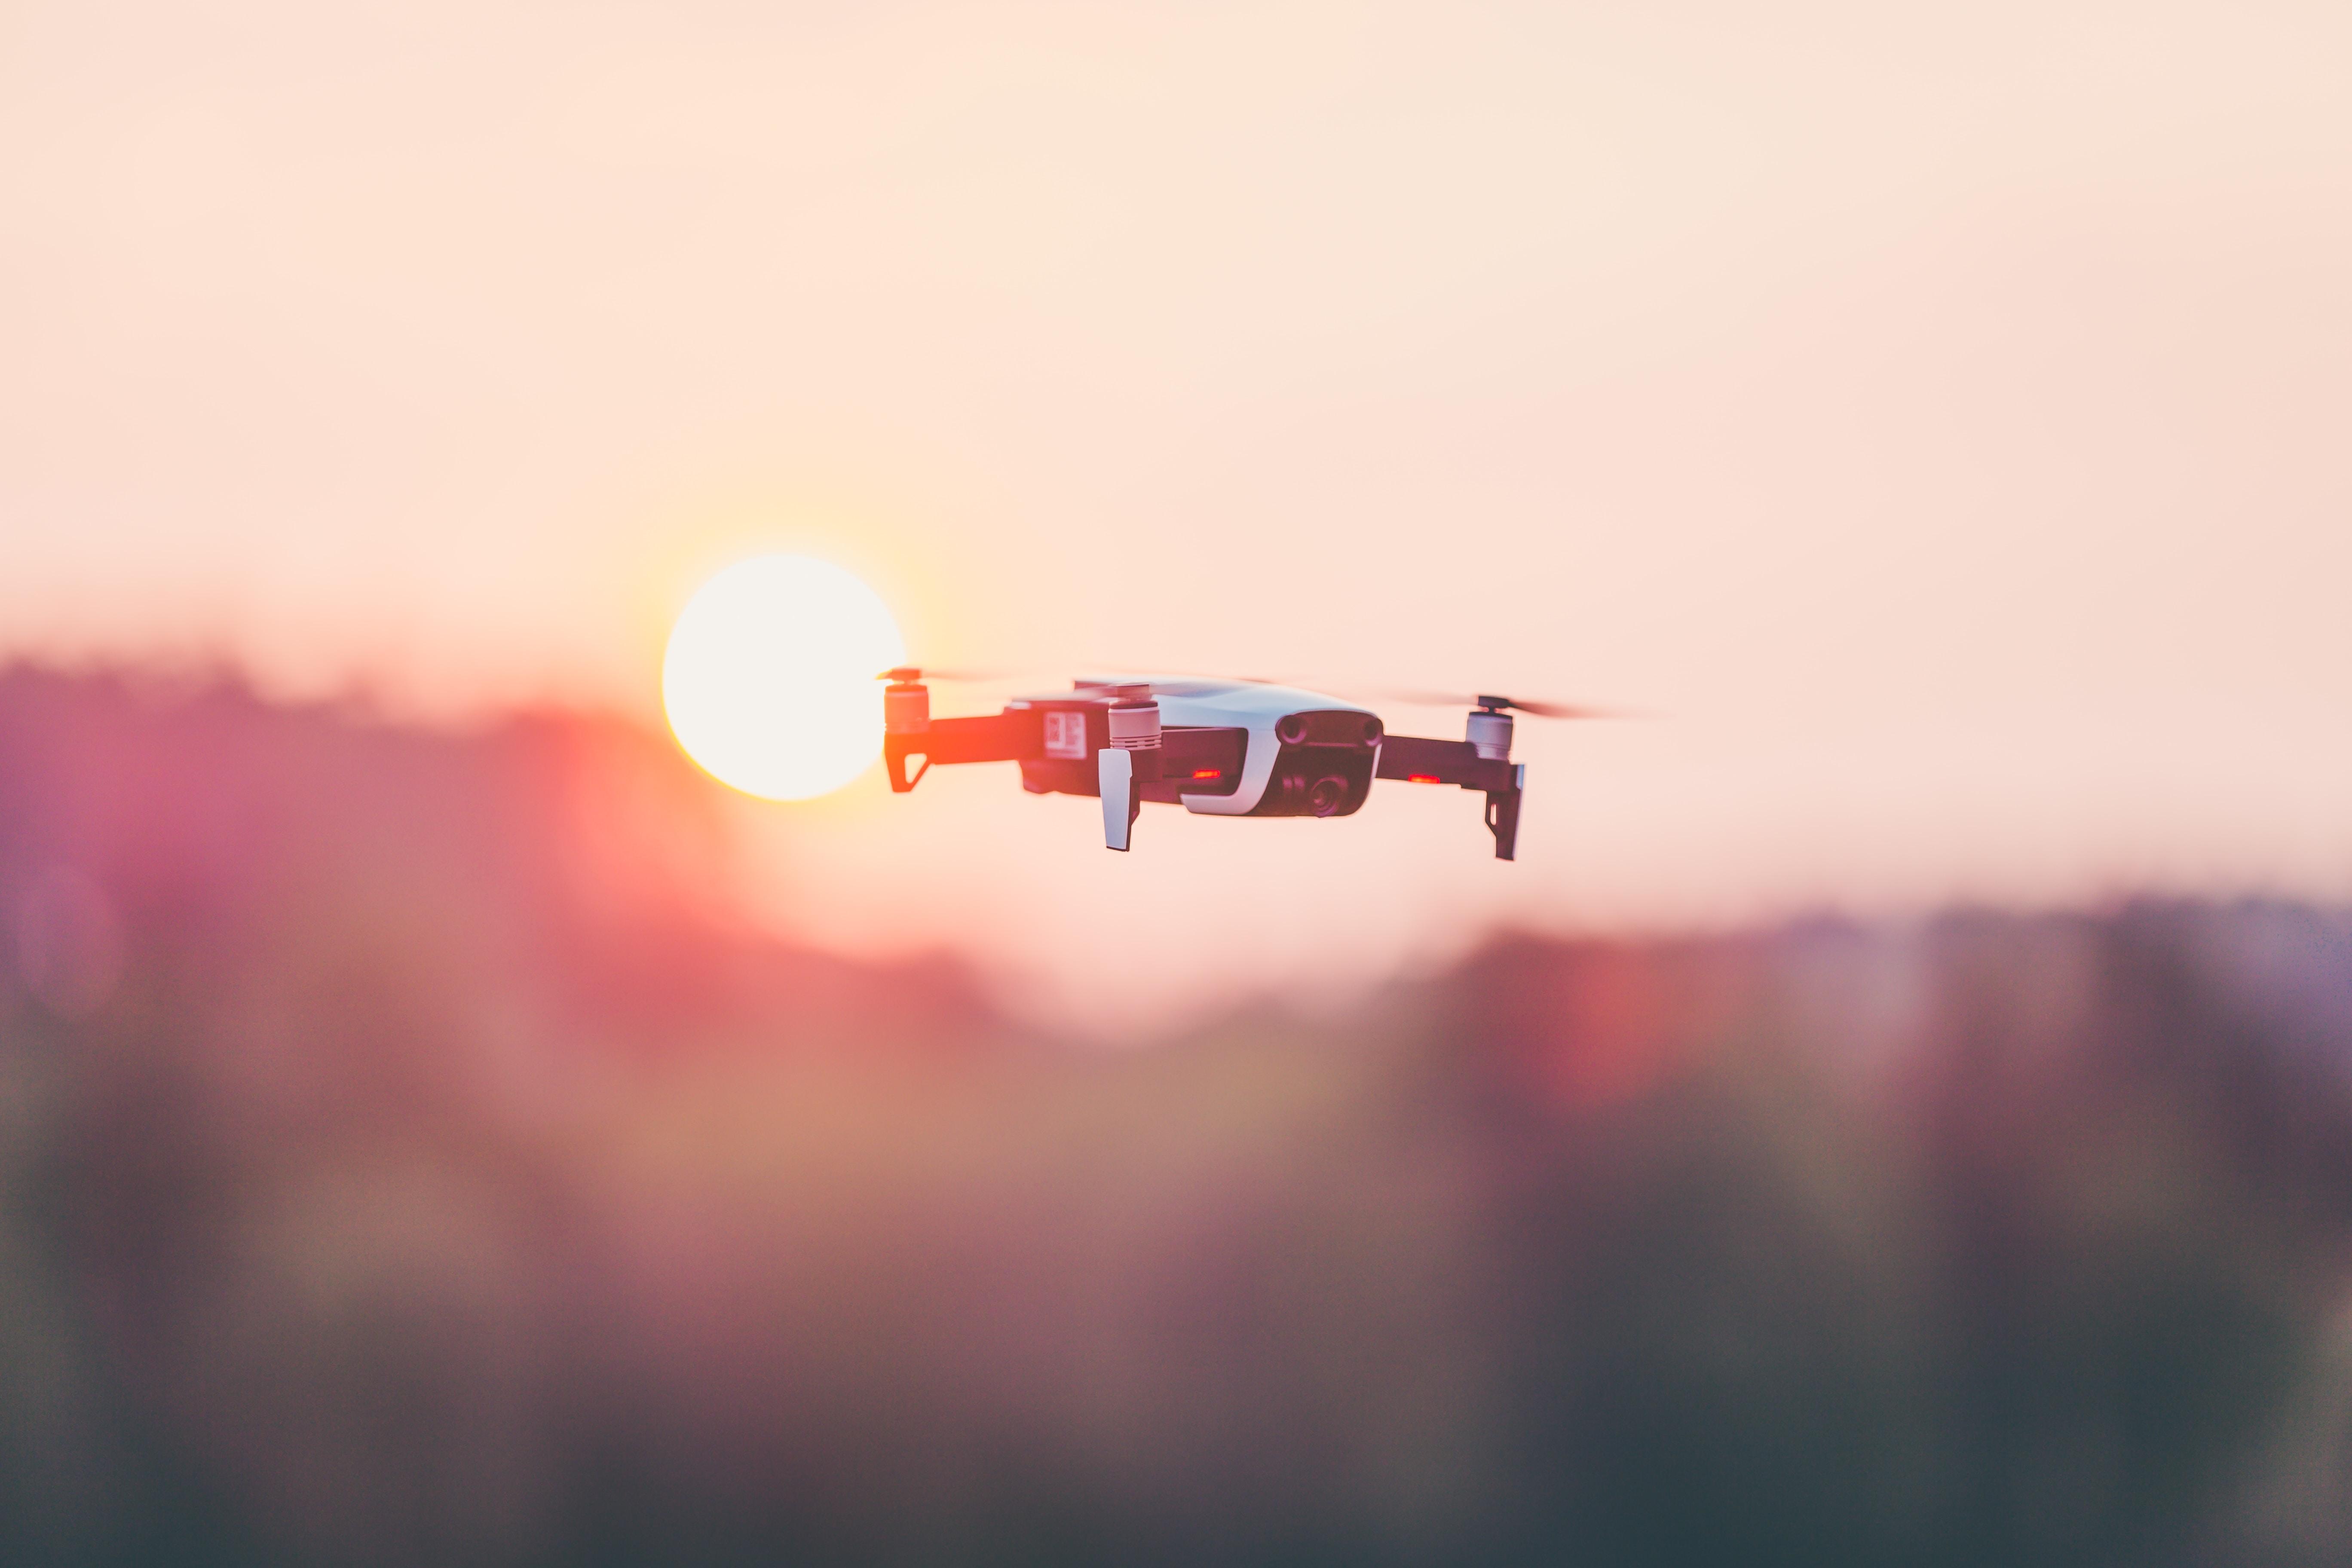 black and white quadcopter drone